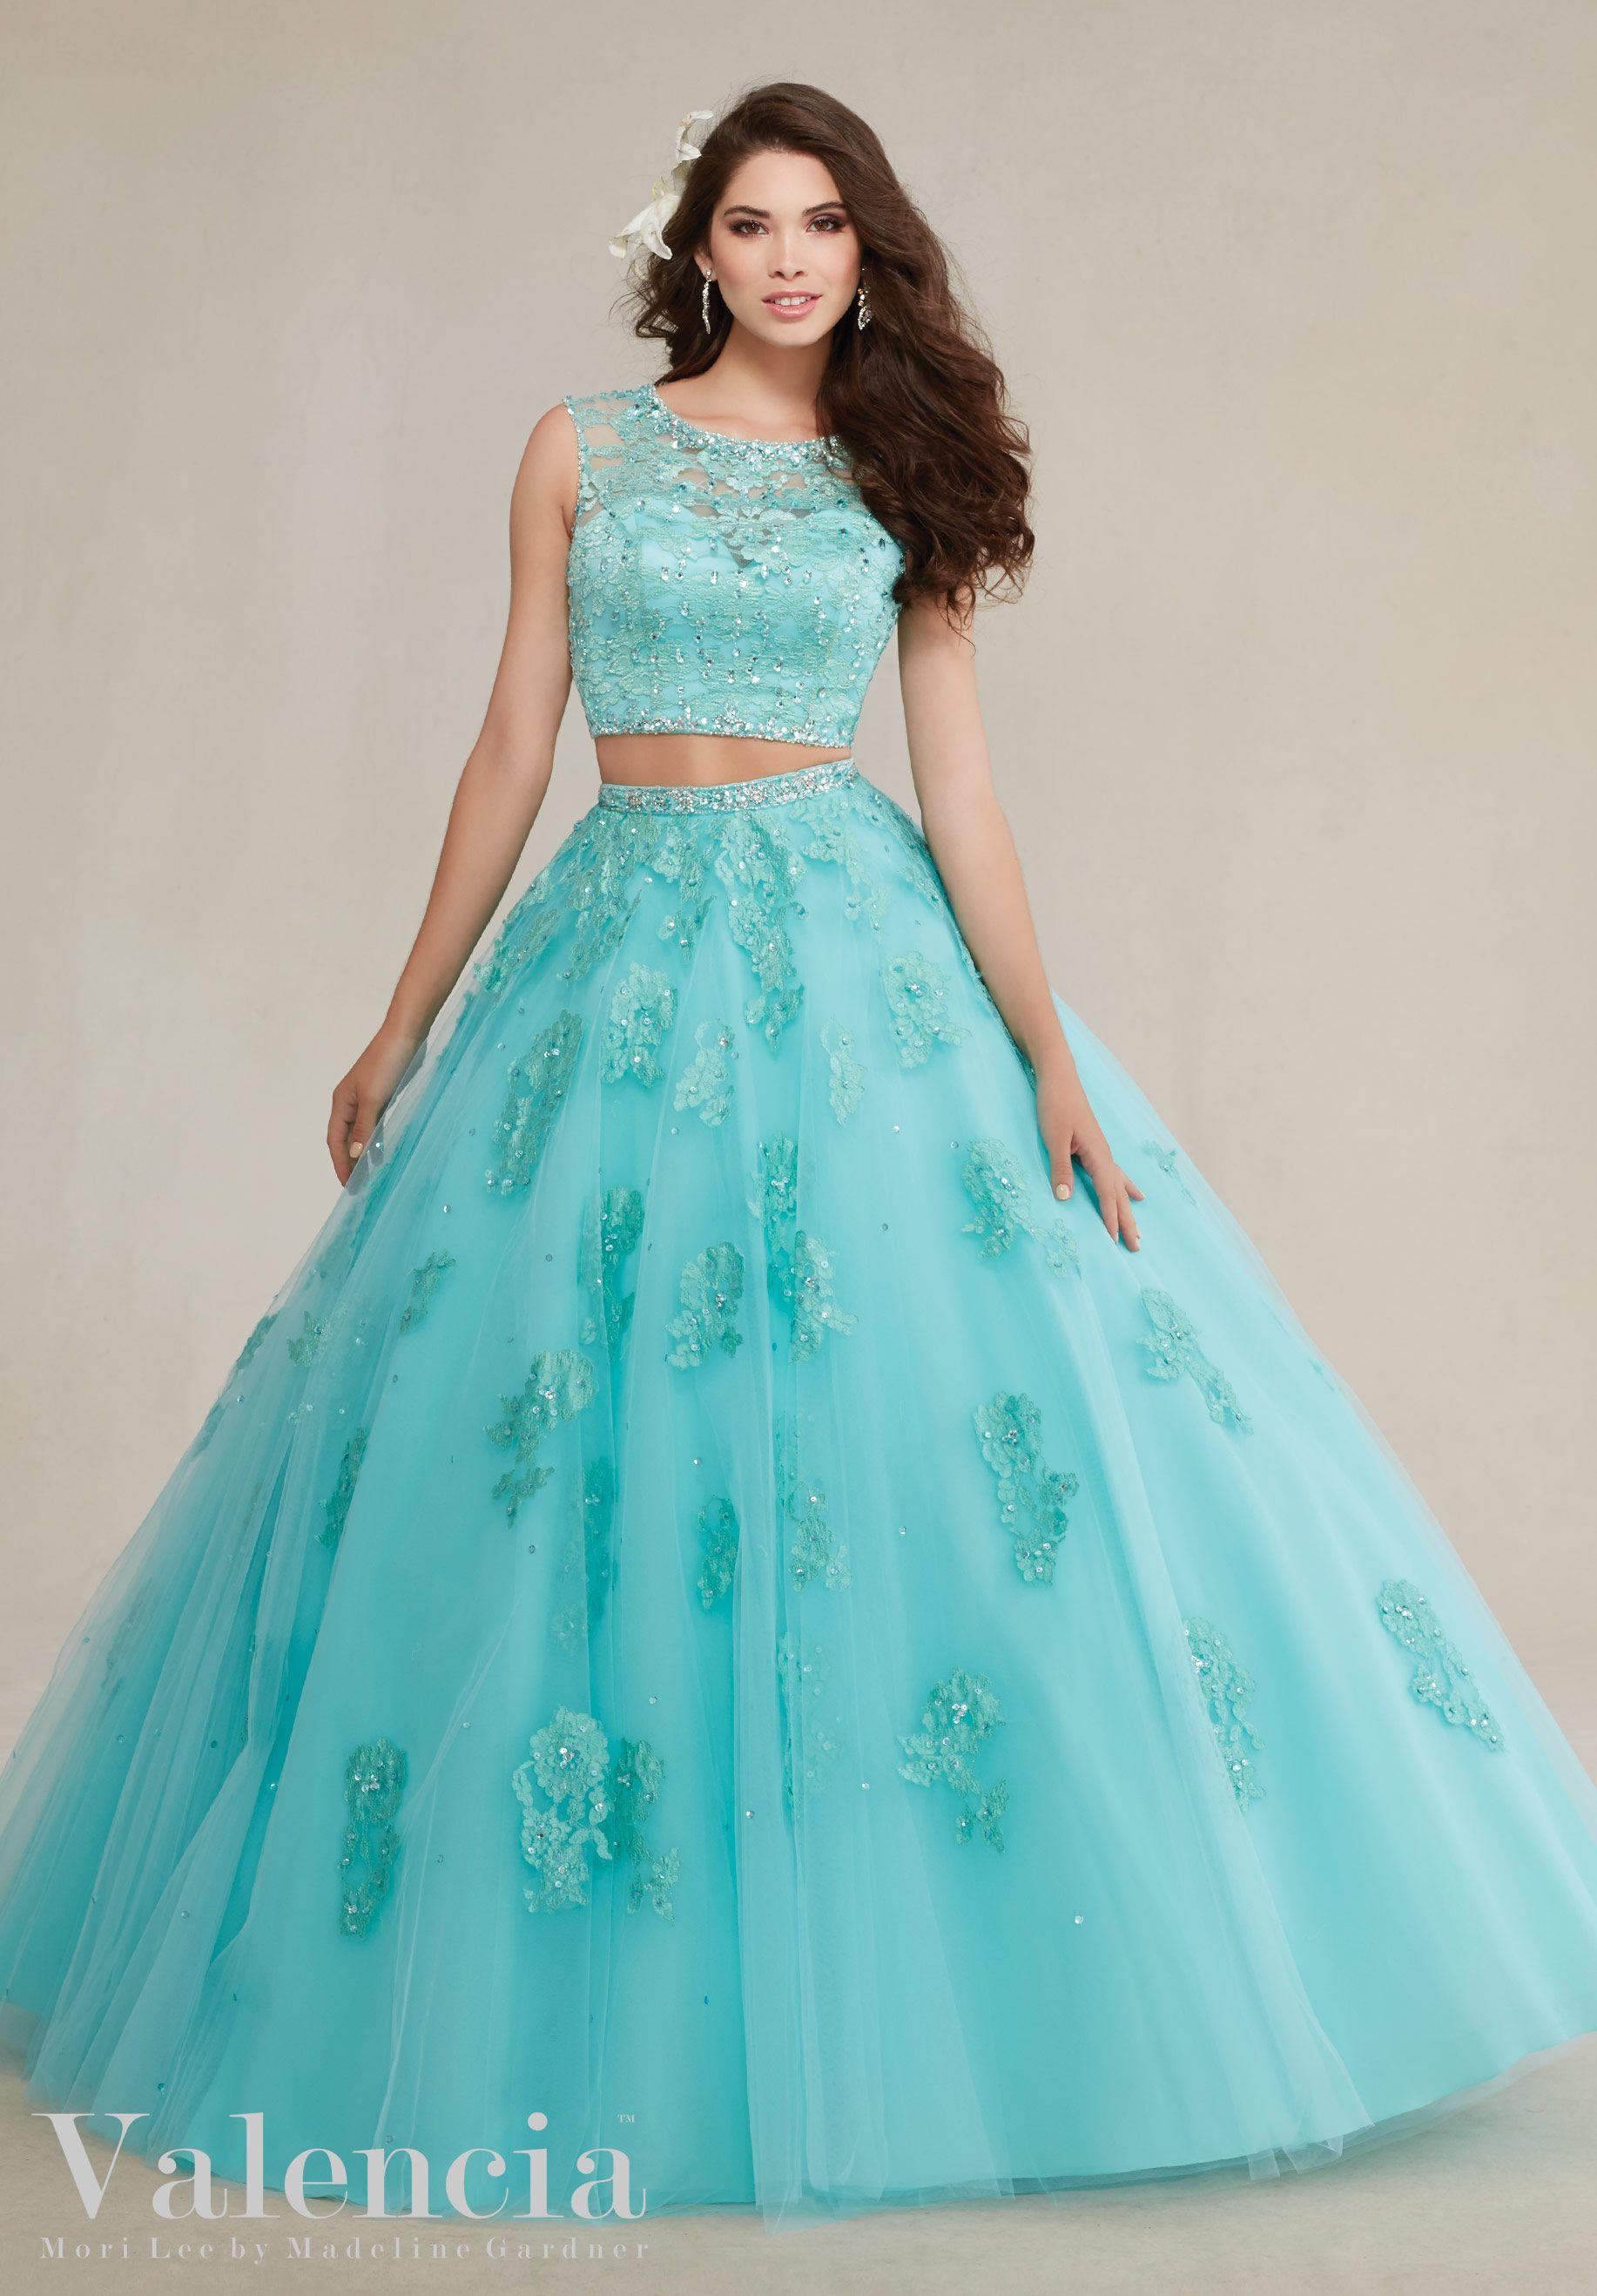 Peach colored quince dresses aqua